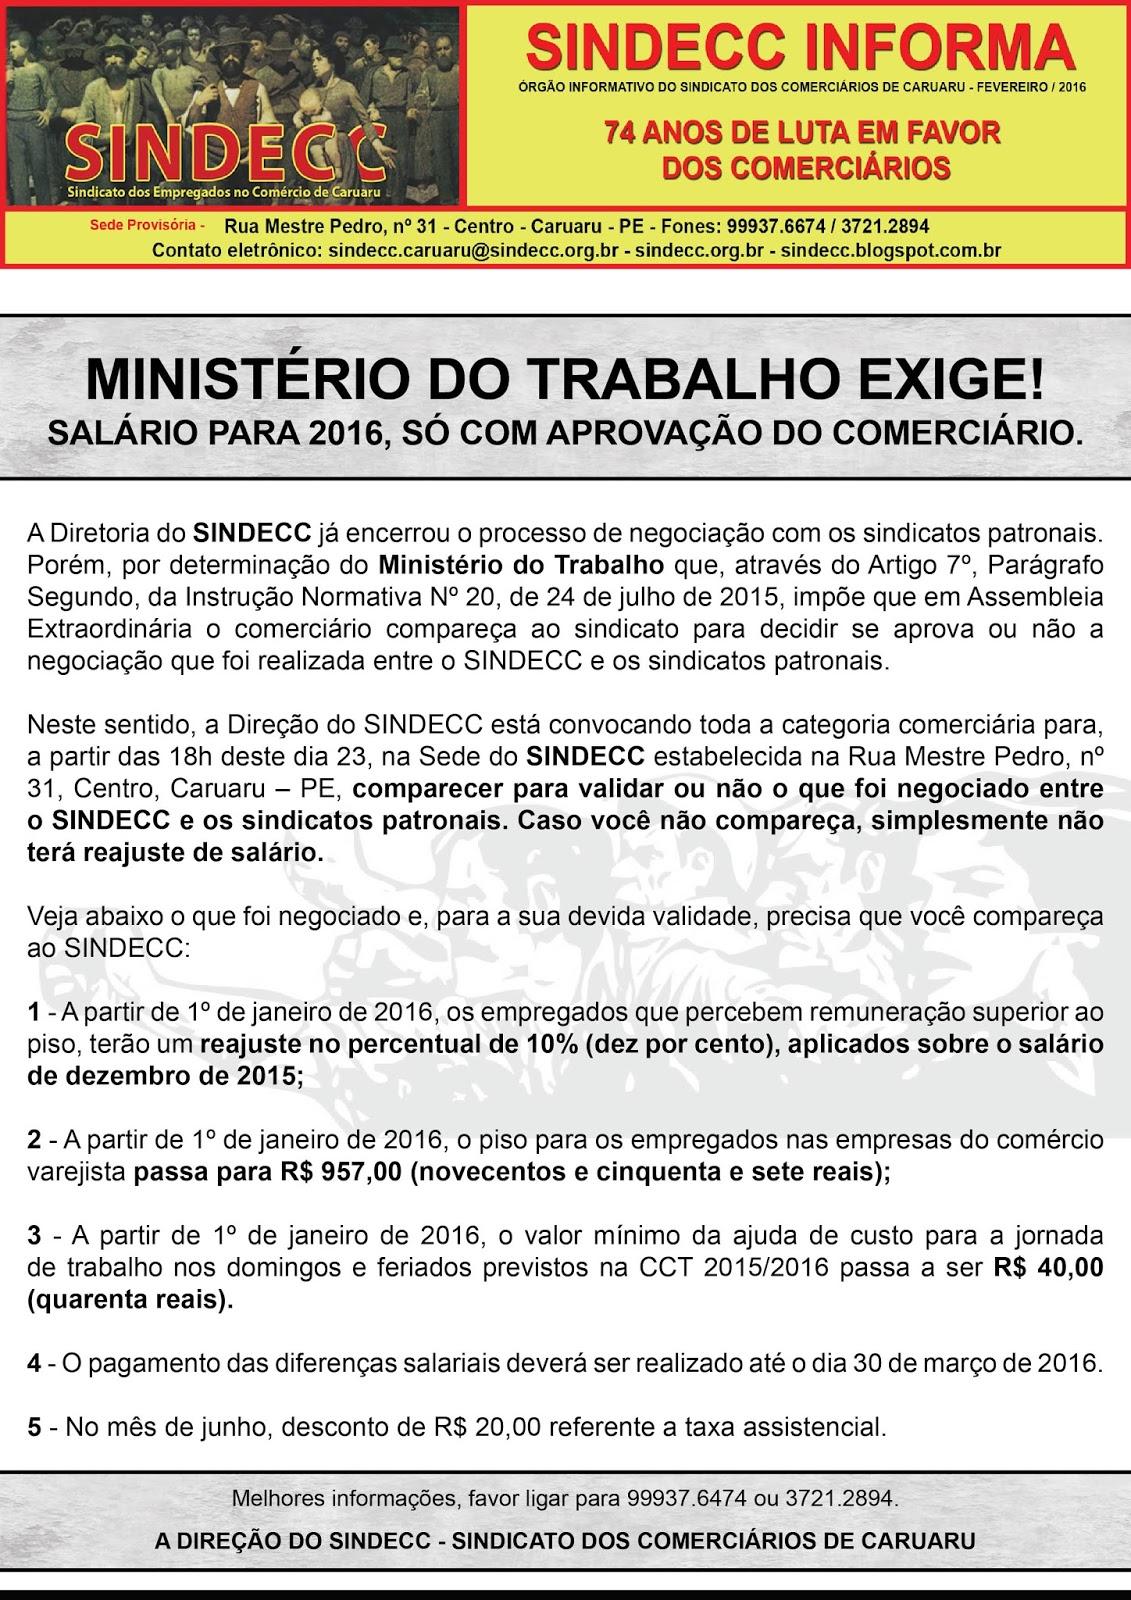 convocacao-salario-para-2016-so-com-a-aprovacao-do-comerciario